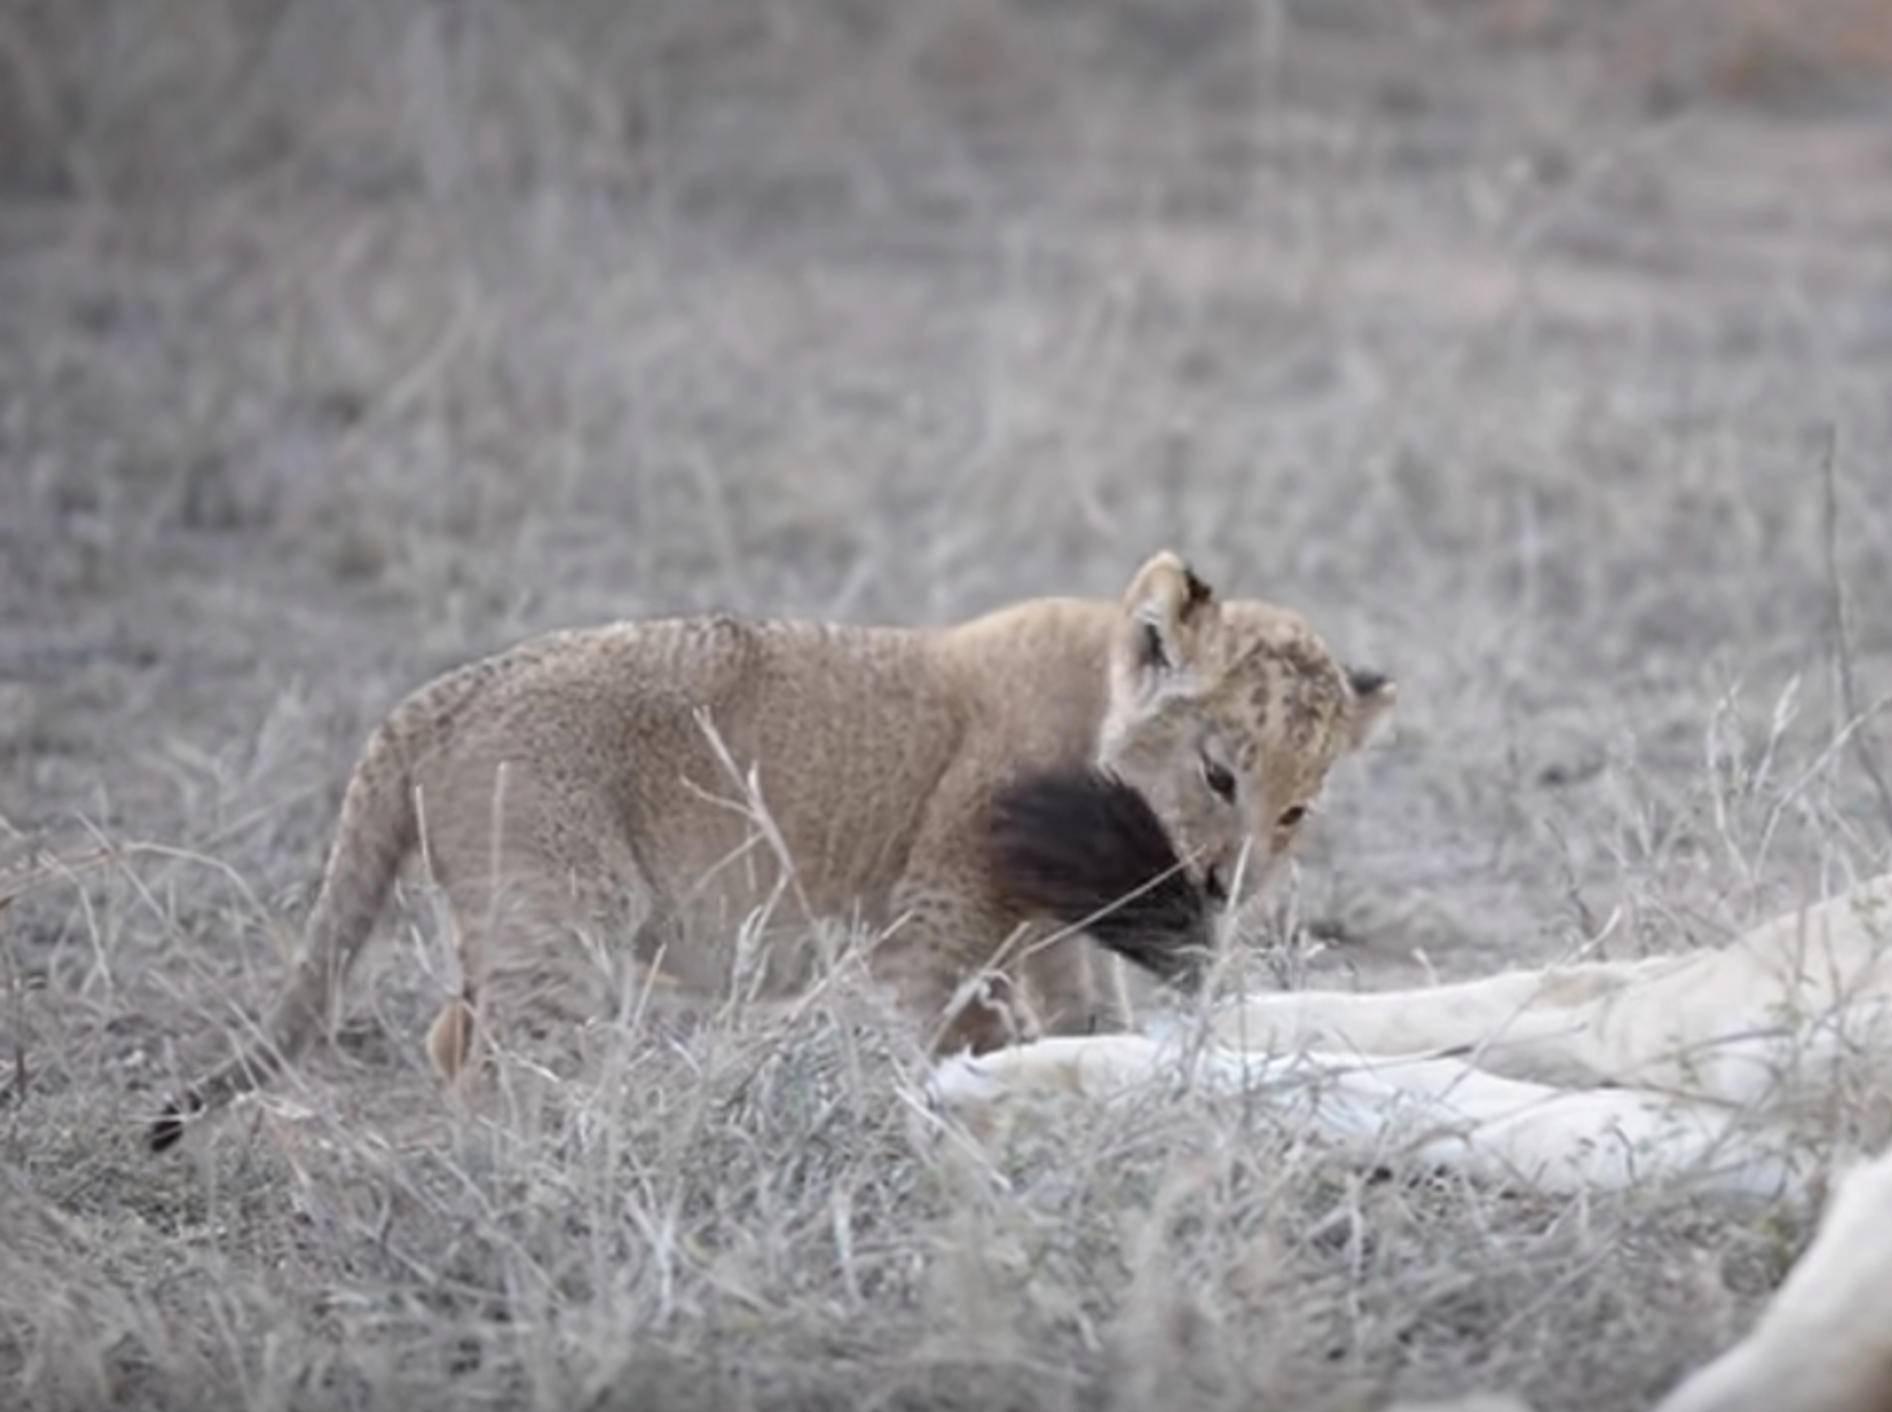 Freches Löwenbaby ärgert Artgenossin – Bild: YouTube / SunDestinations